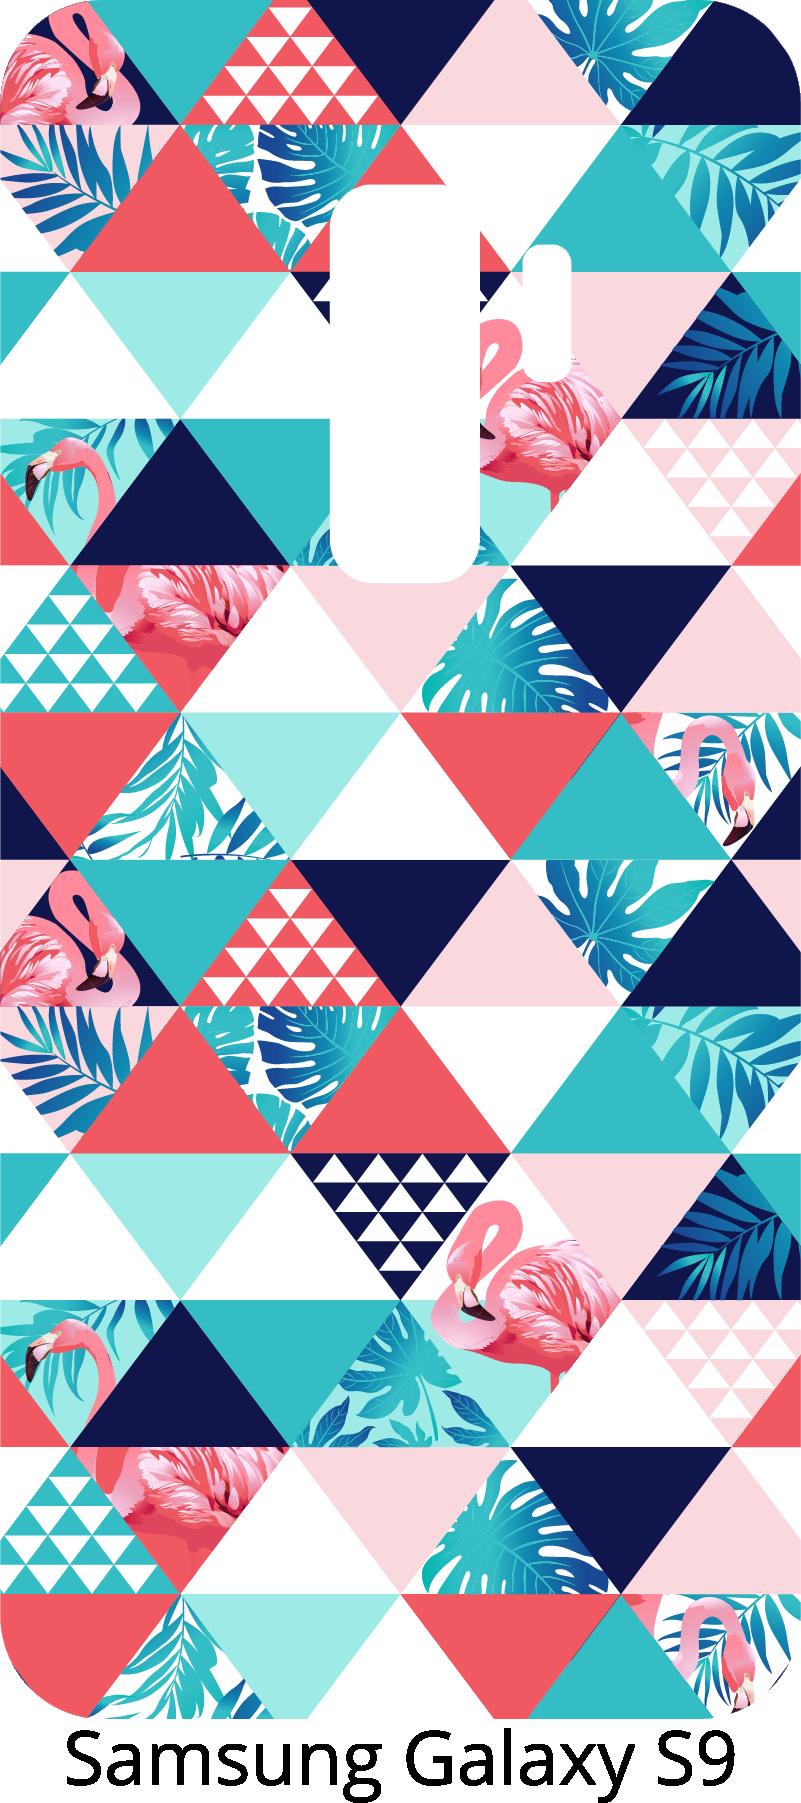 TenStickers. 热带和几何装饰手机贴纸. 三星和其他制造商的智能手机贴纸。用智能手机的原始装饰让你的朋友们惊叹不已。热带图案!